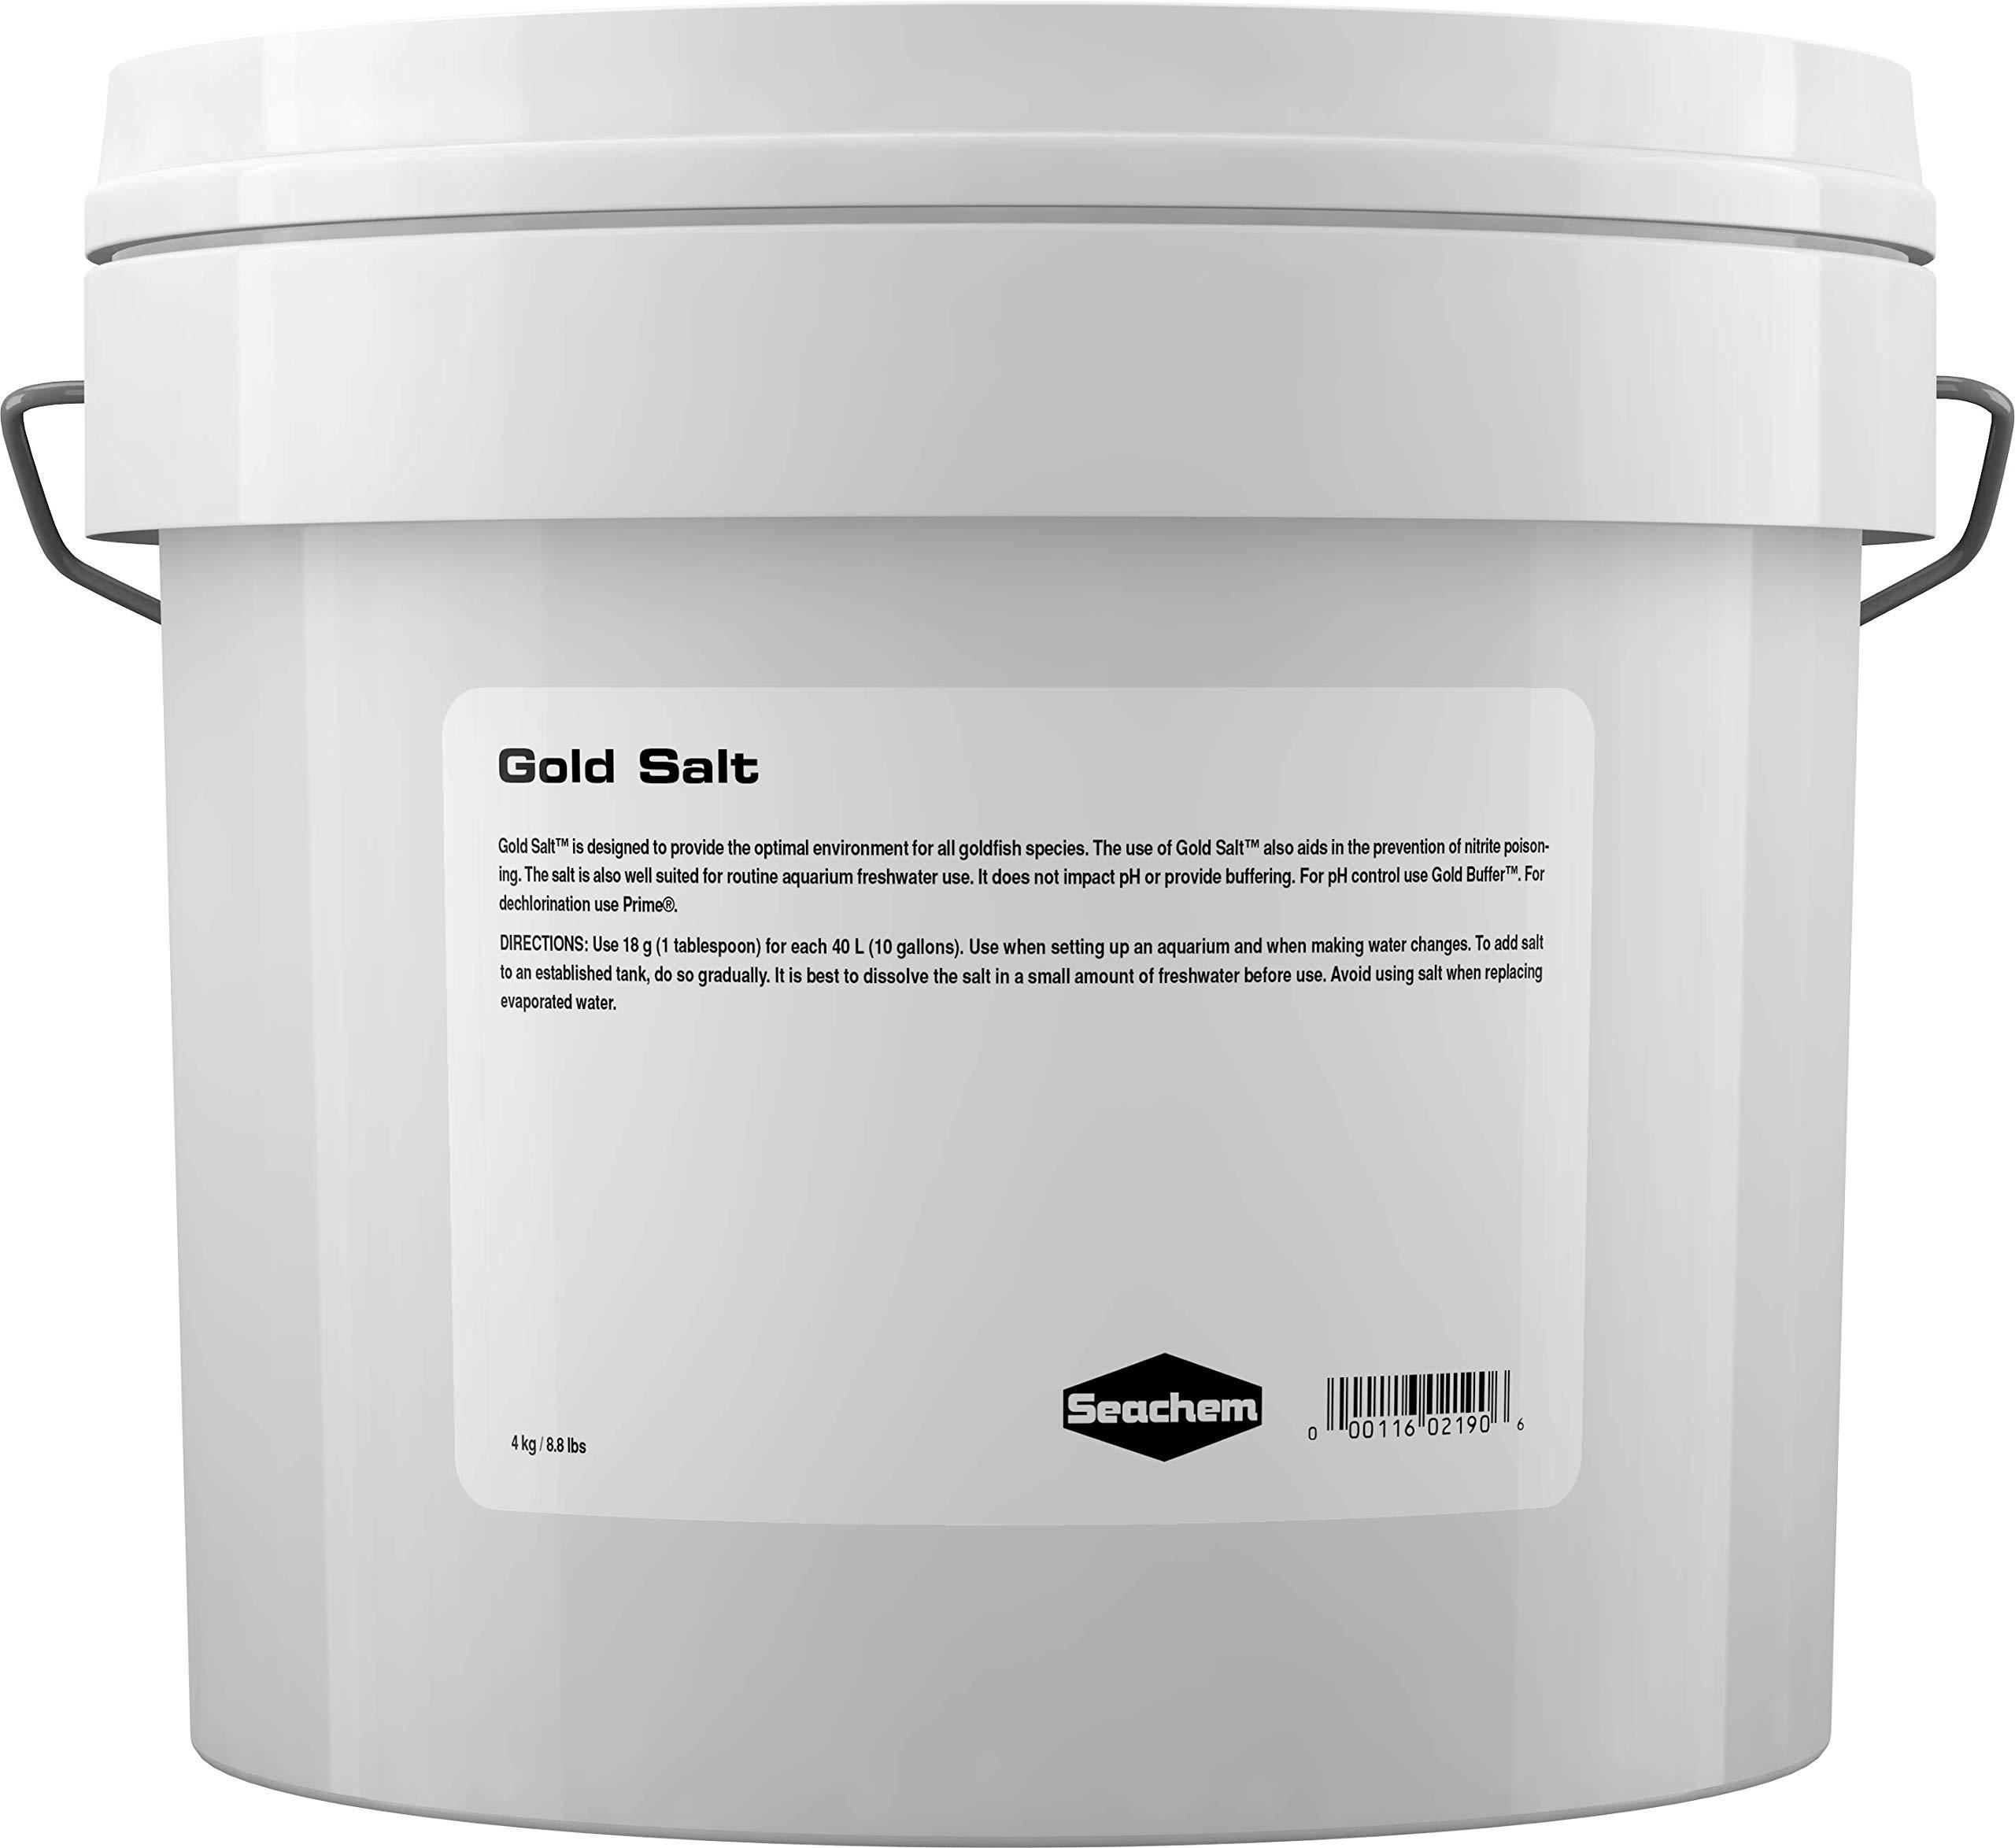 Gold Salt, 4 kg / 8.8 lbs by Seachem